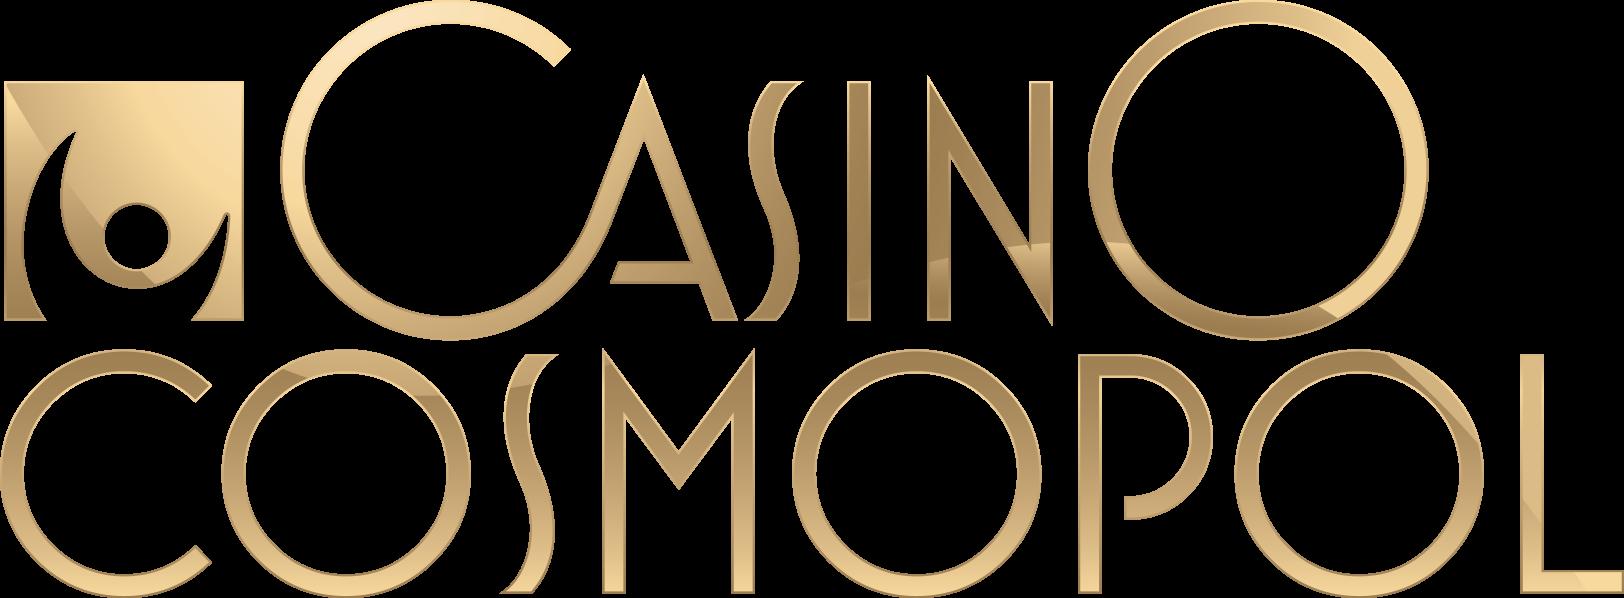 Pa casino age rules huking casino скачать